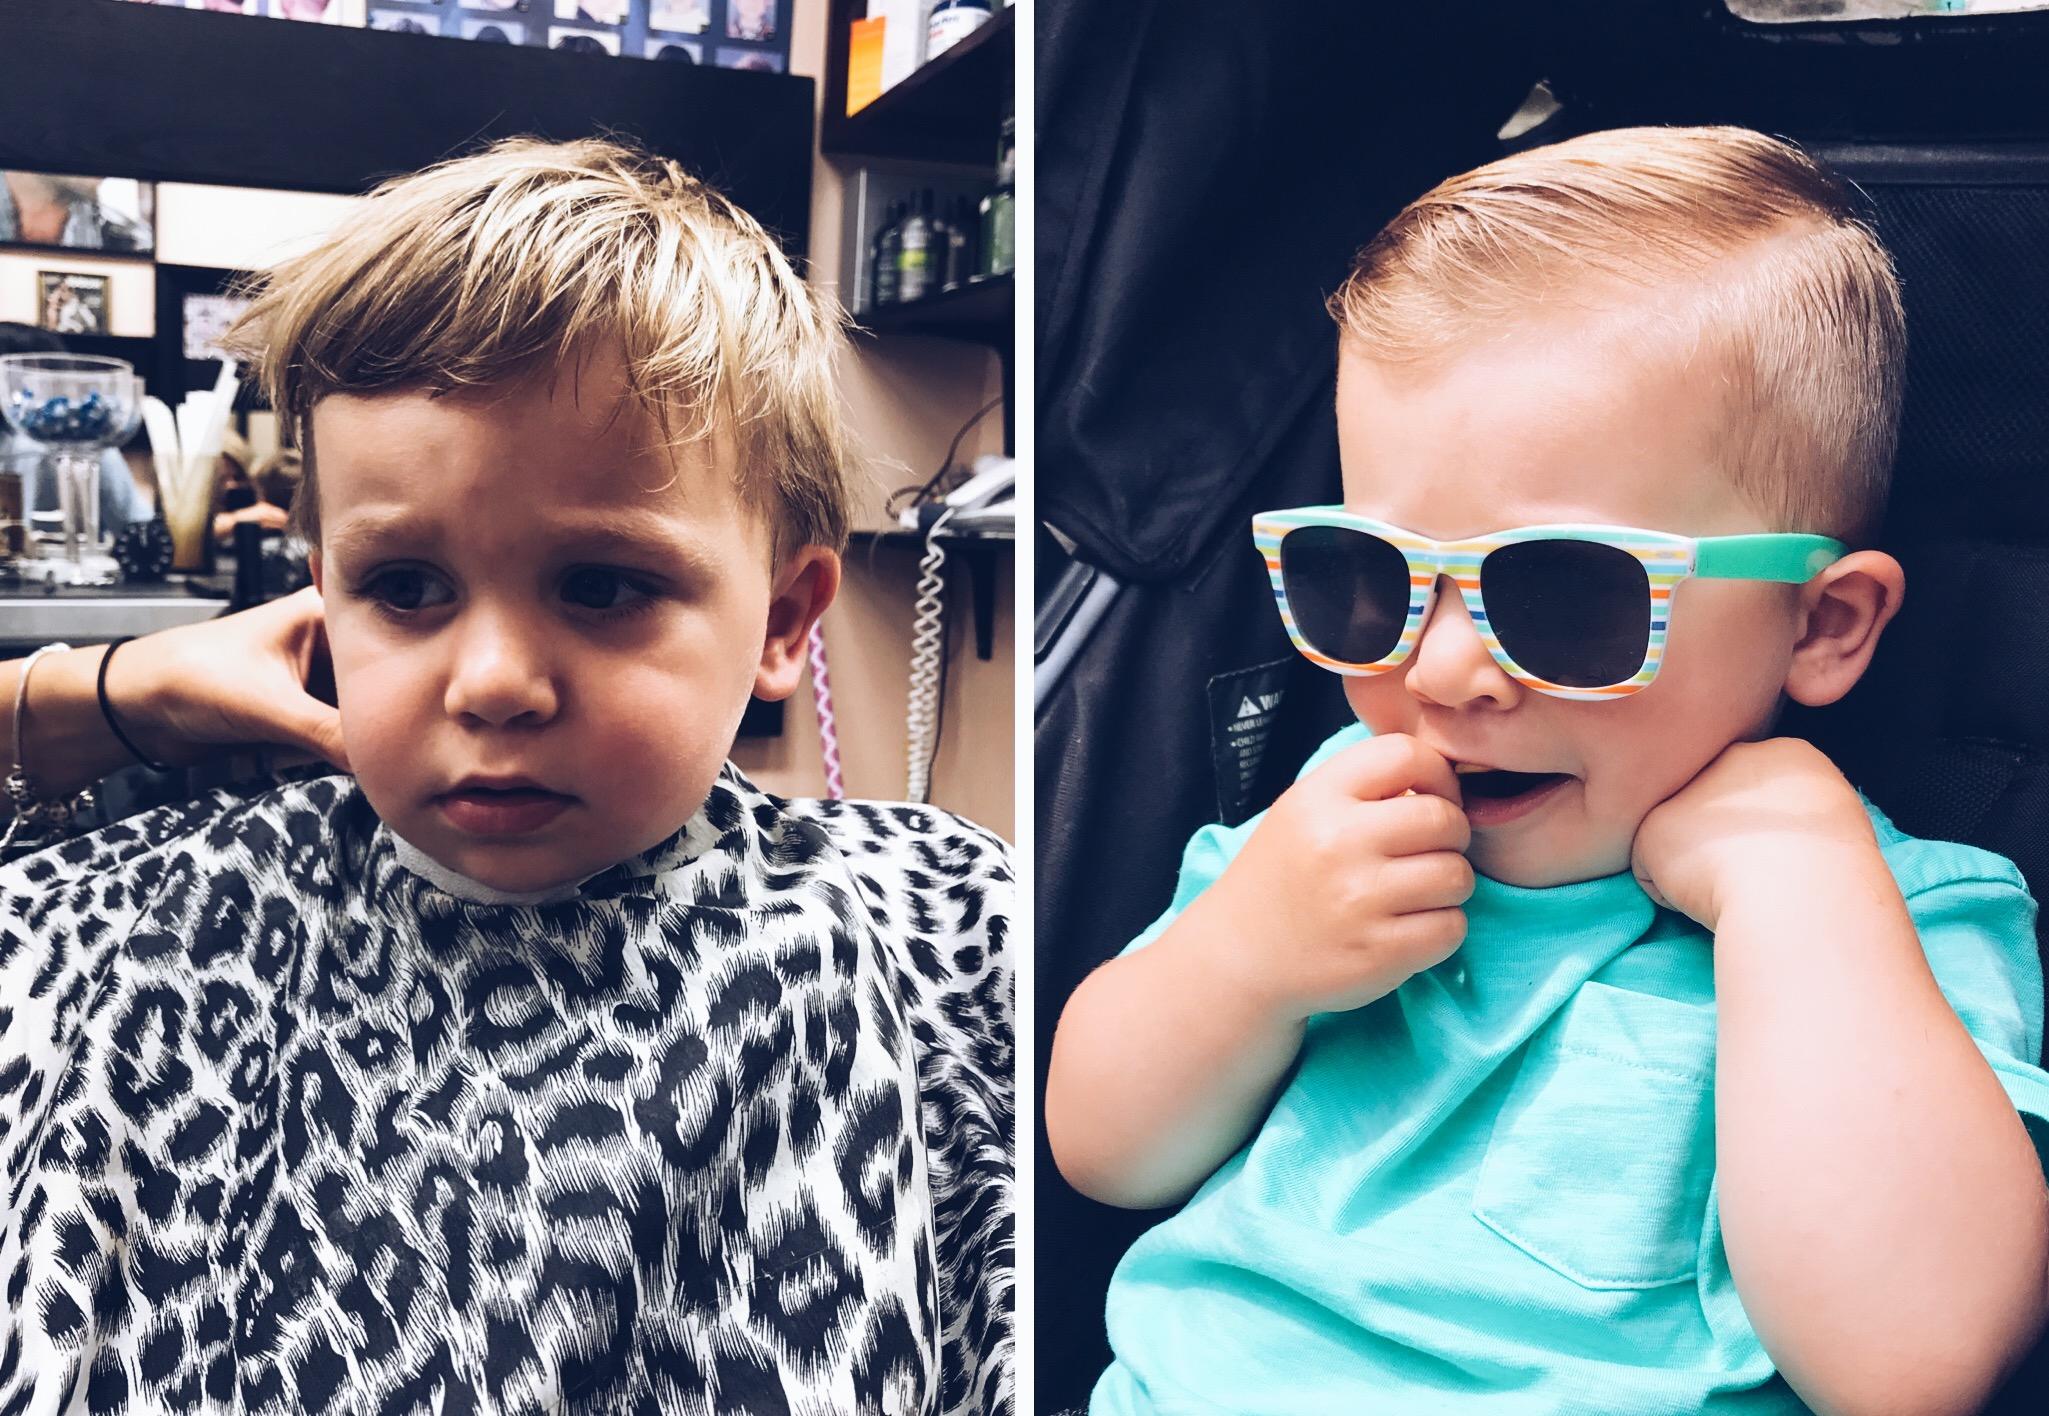 Toddler Boy Haircut Ideas. Toddler Fade Haircut. Best haircuts for boys. #toddlerhaircuts #toddlerfade #boyhaircut